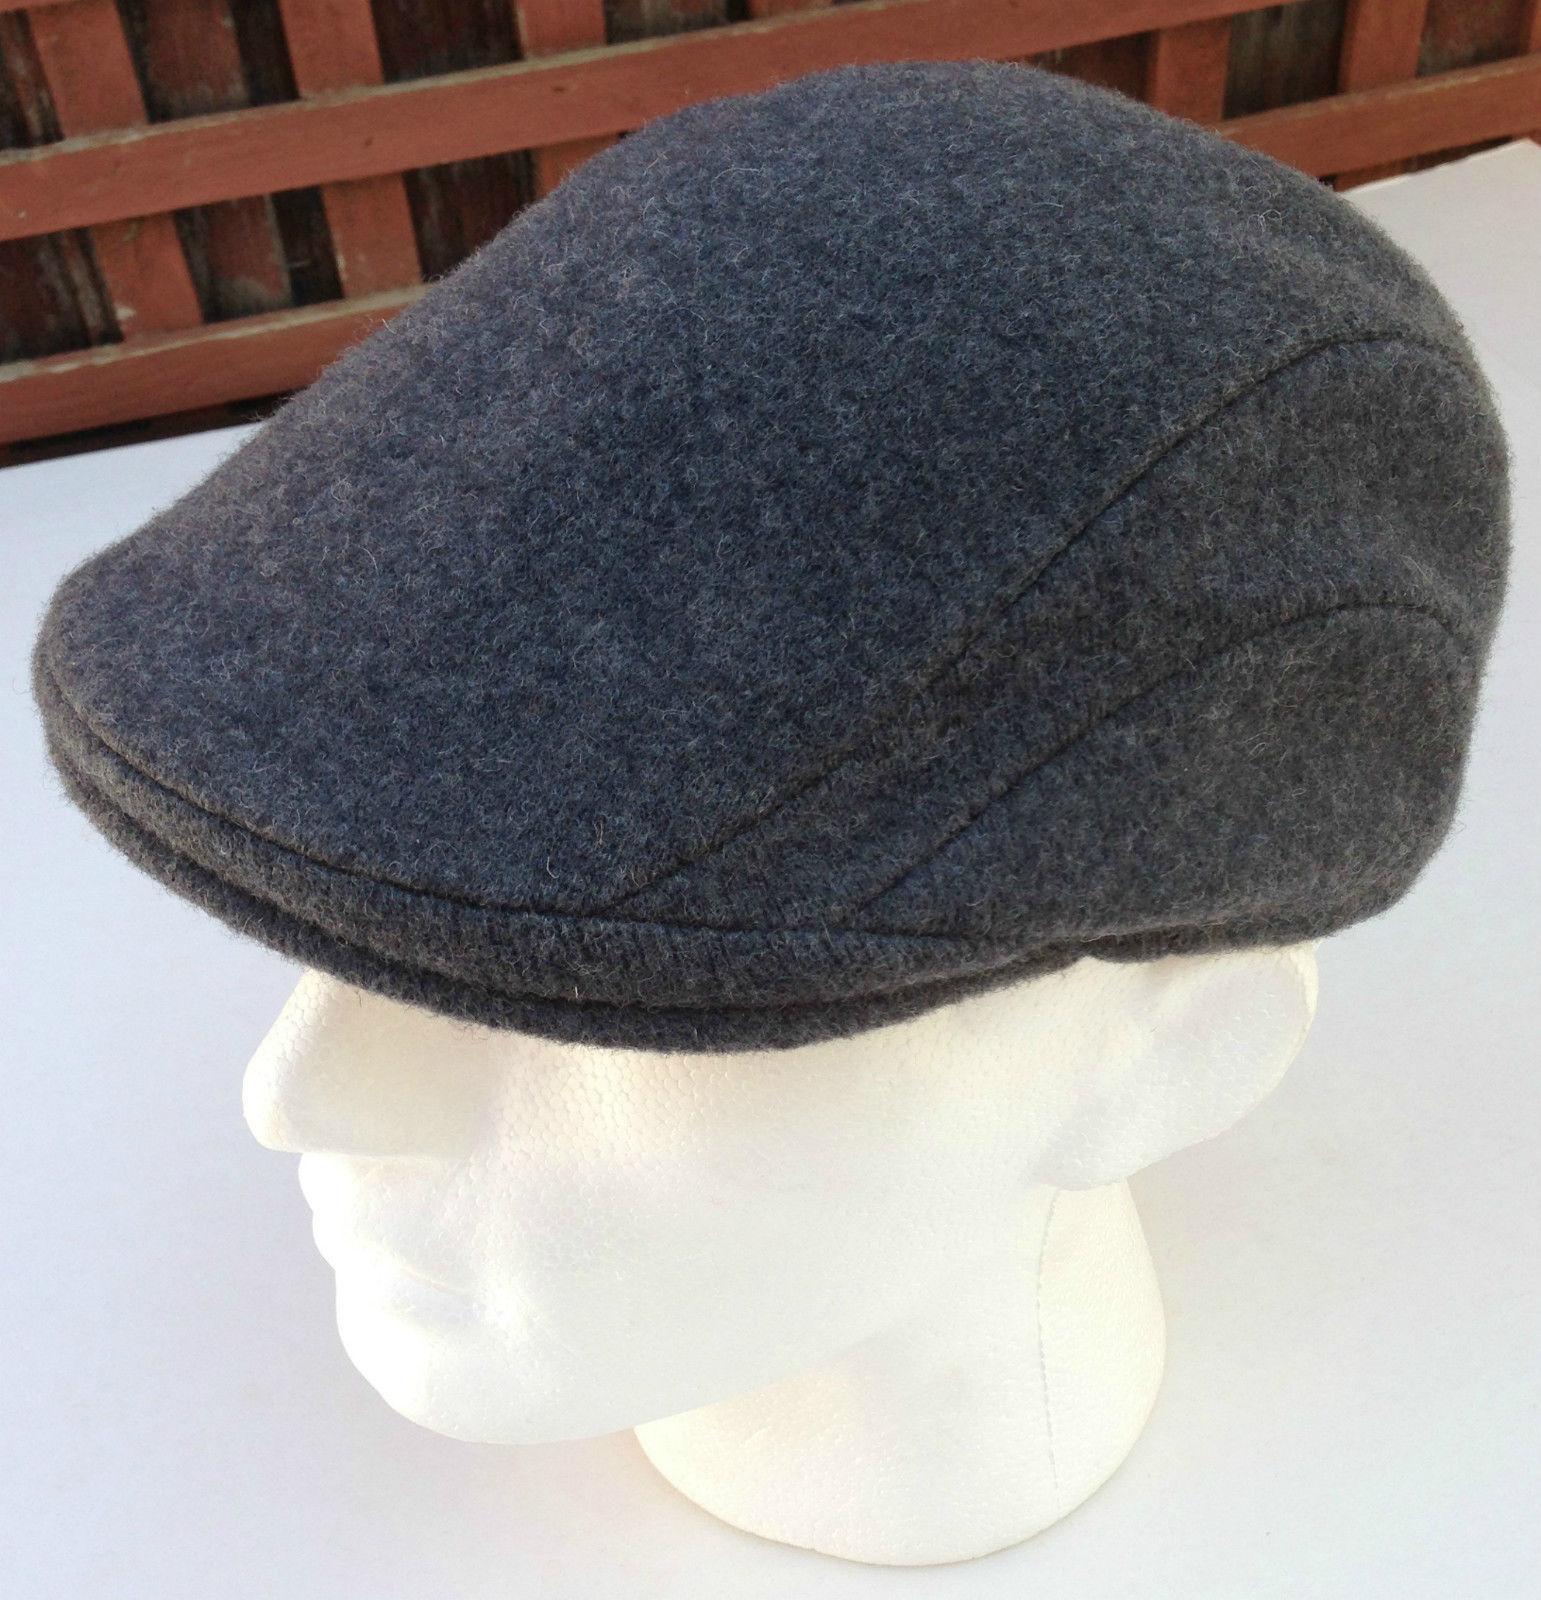 KANGOL-507-Wool-Ivy-Hat-Cap-Mens-Warm-Classic-Winter-Flat-Driving-6845BC thumbnail 26